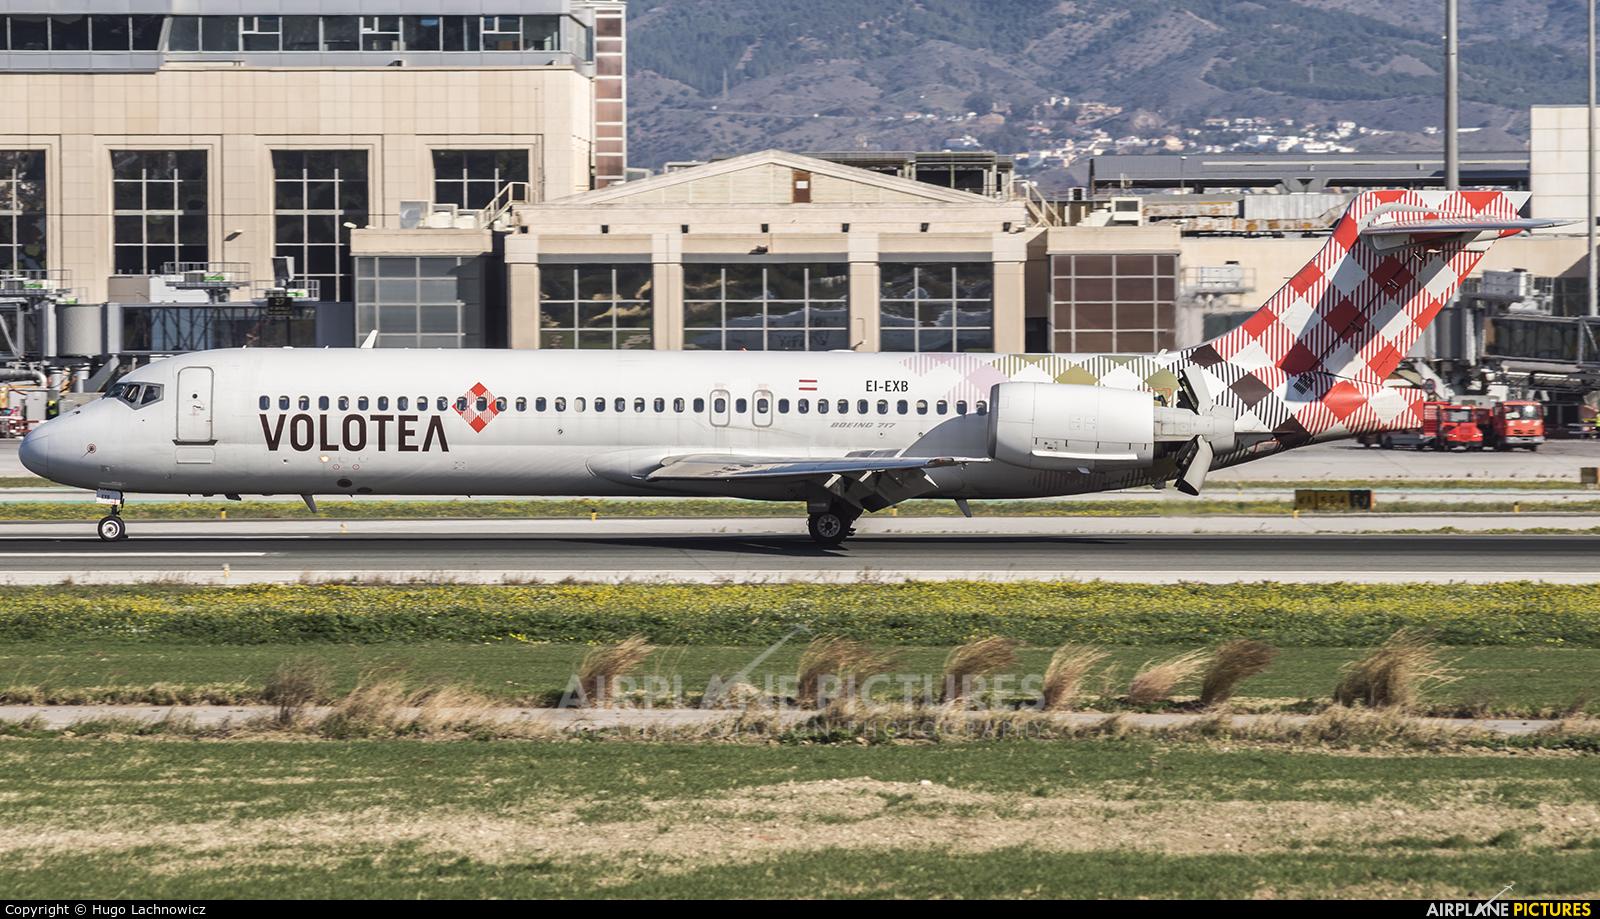 Volotea Airlines EI-EXB aircraft at Málaga